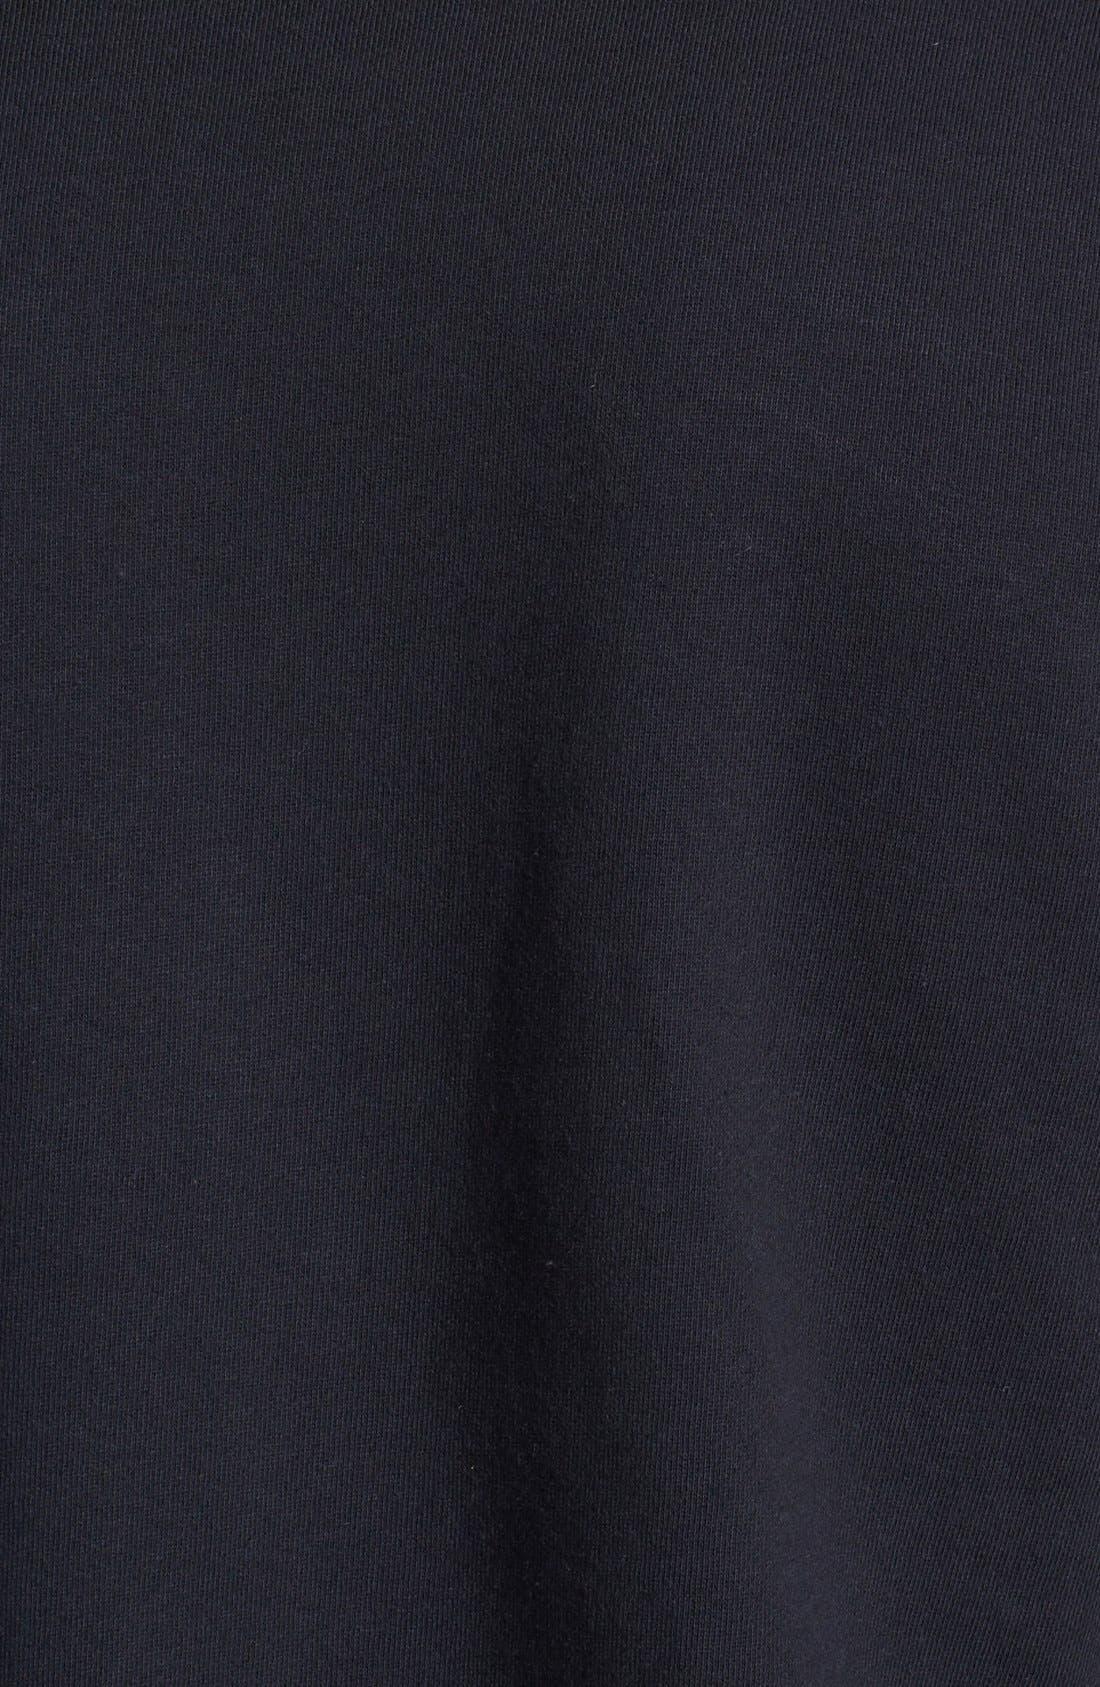 Alternate Image 3  - Mitchell & Ness 'Toronto Raptors' Sweatshirt